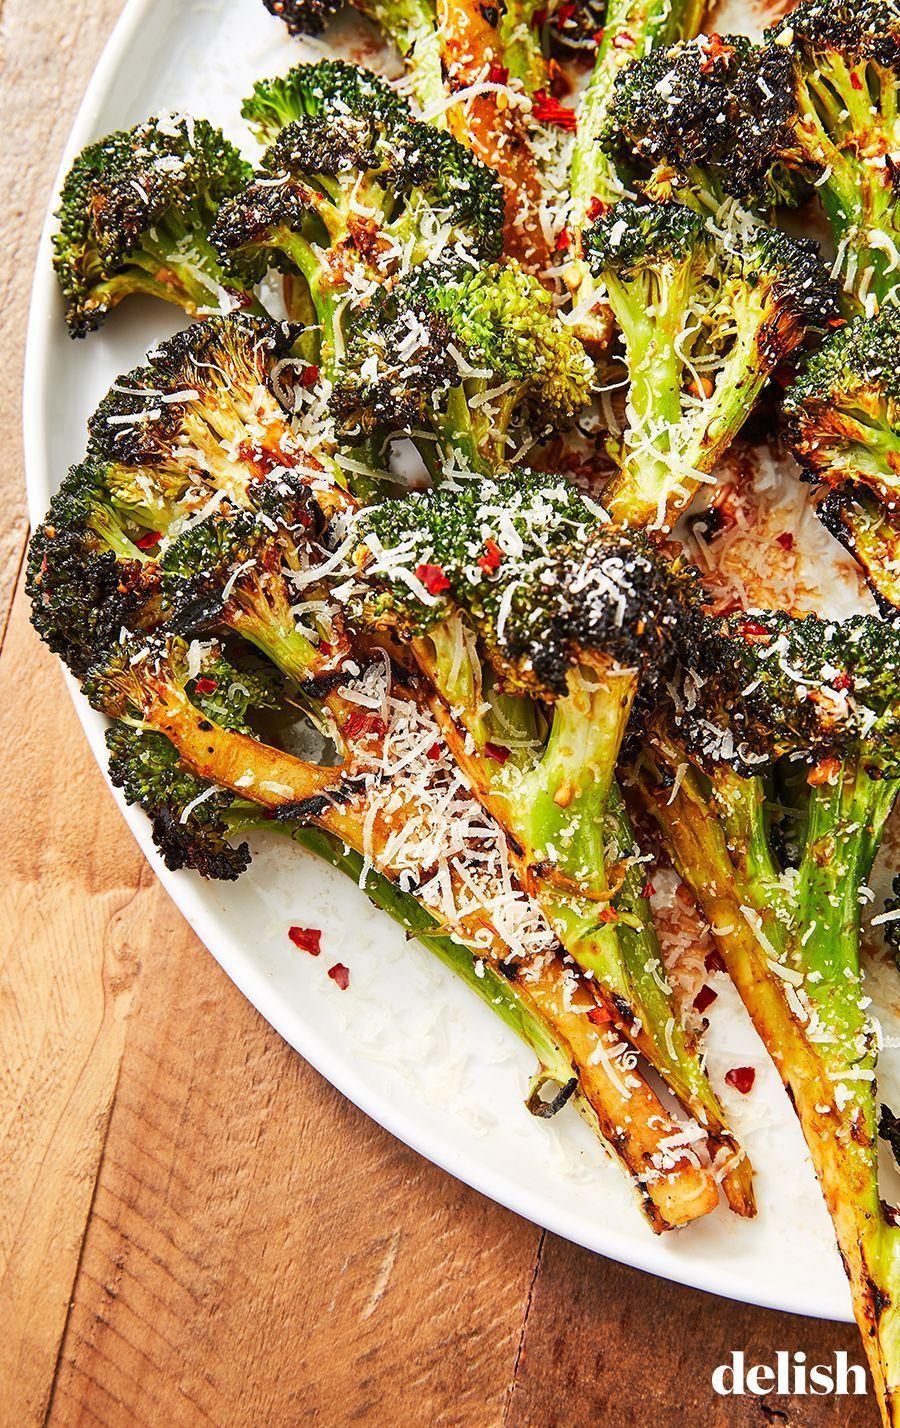 Grilled Broccoli #grillingrecipes Parm, honey, and garlic make broccoli infinite... ,  #Broccoli #Garlic #Grilled #grillingrecipes #healthyrecipesfordiabetics #Honey #infinite #Parm